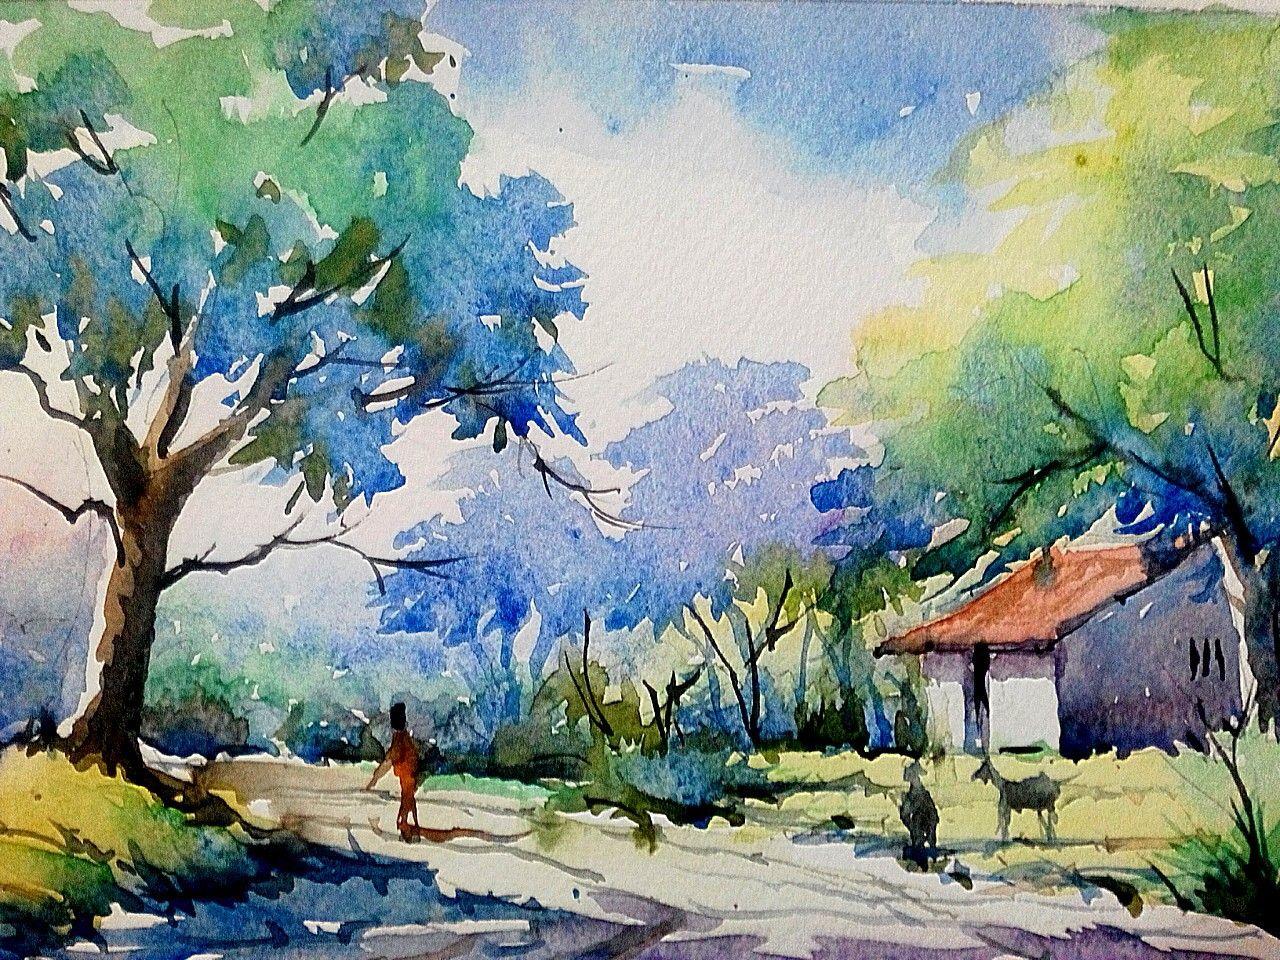 1280x960 Gallery Beautiful Watercolor Paintings Of Nature,